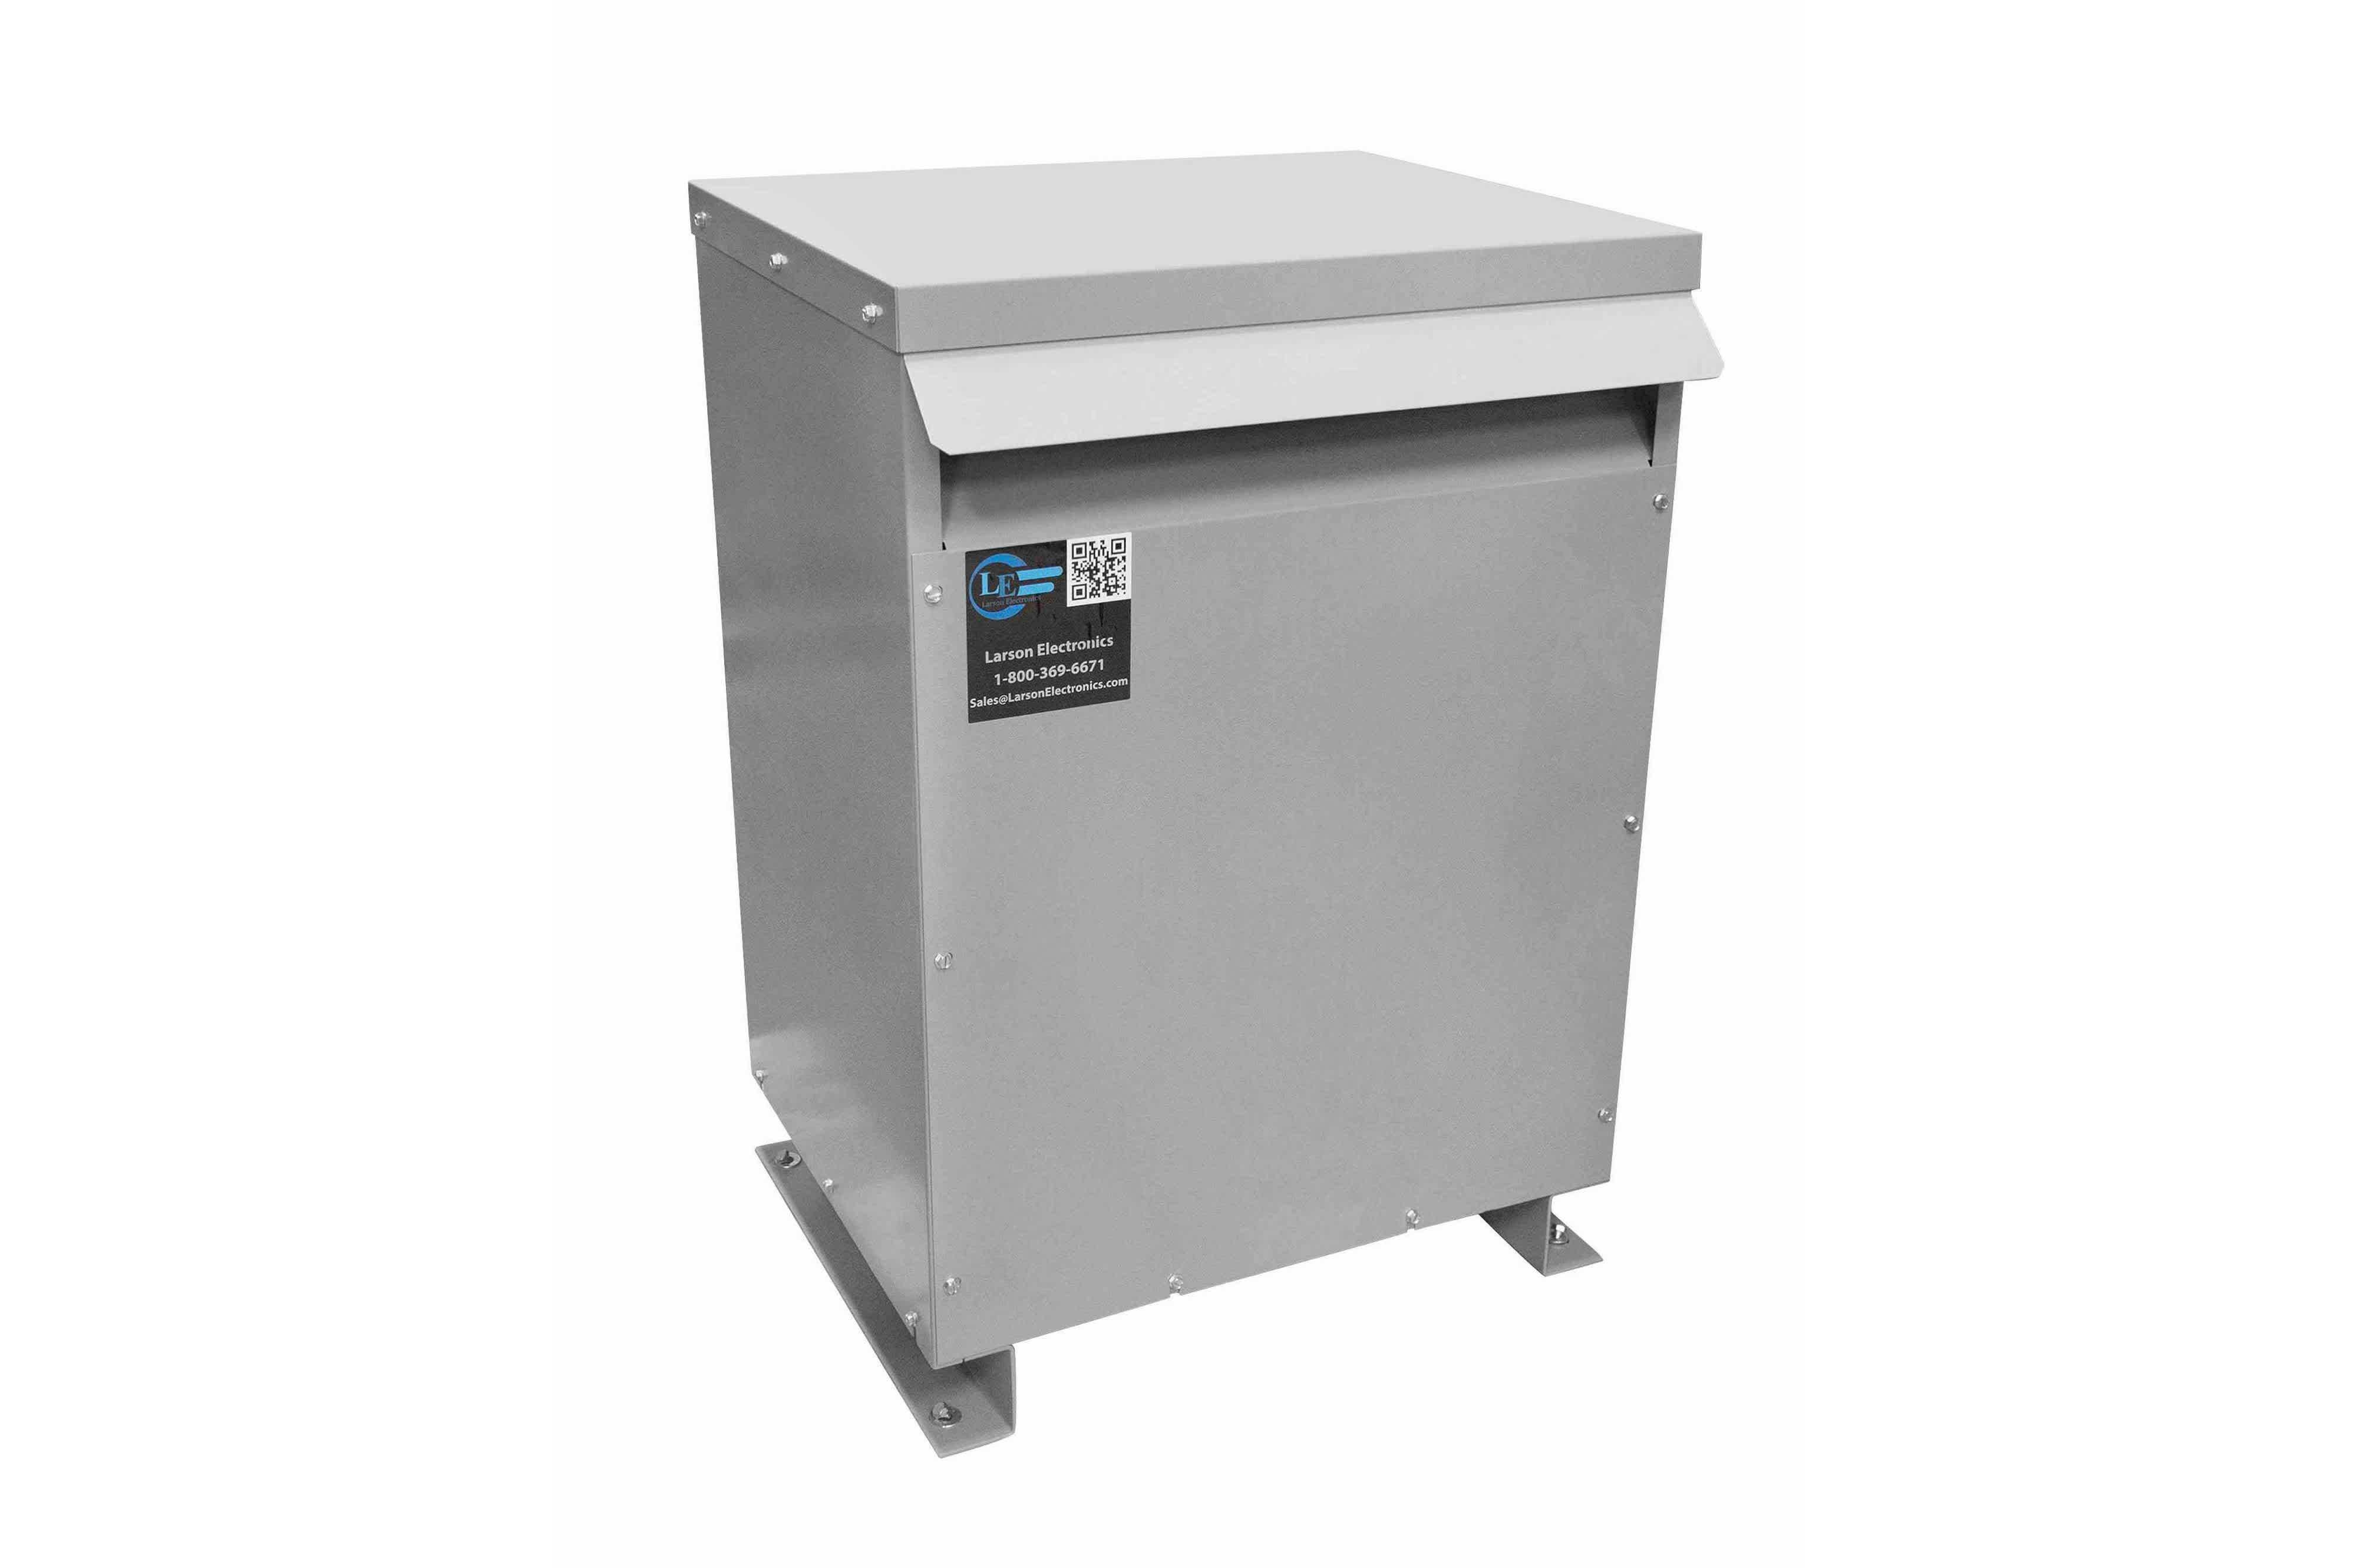 9 kVA 3PH Isolation Transformer, 240V Wye Primary, 380Y/220 Wye-N Secondary, N3R, Ventilated, 60 Hz